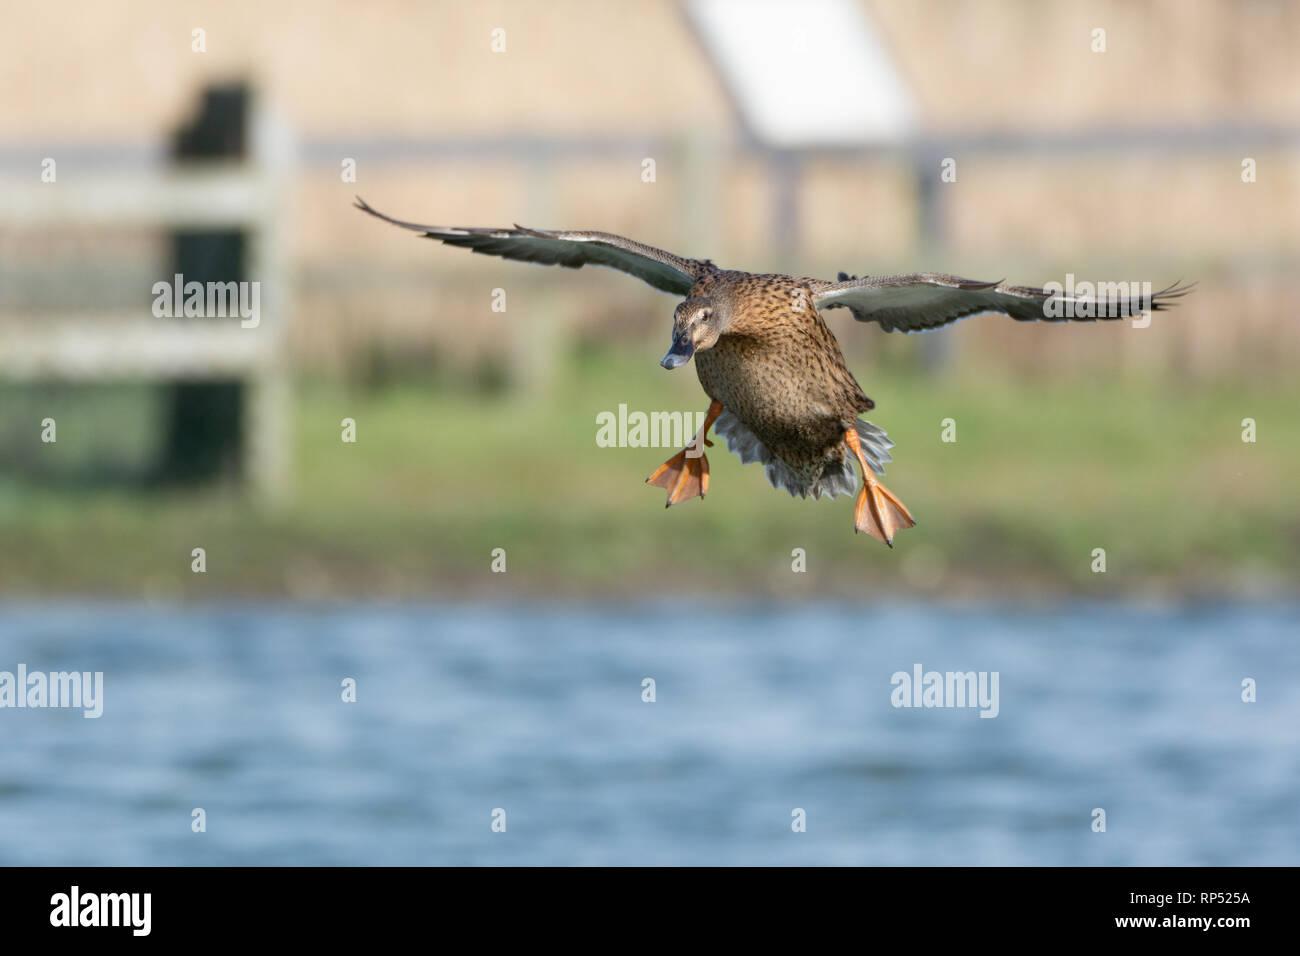 Female Mallard duck in flight coming in to land - Stock Image